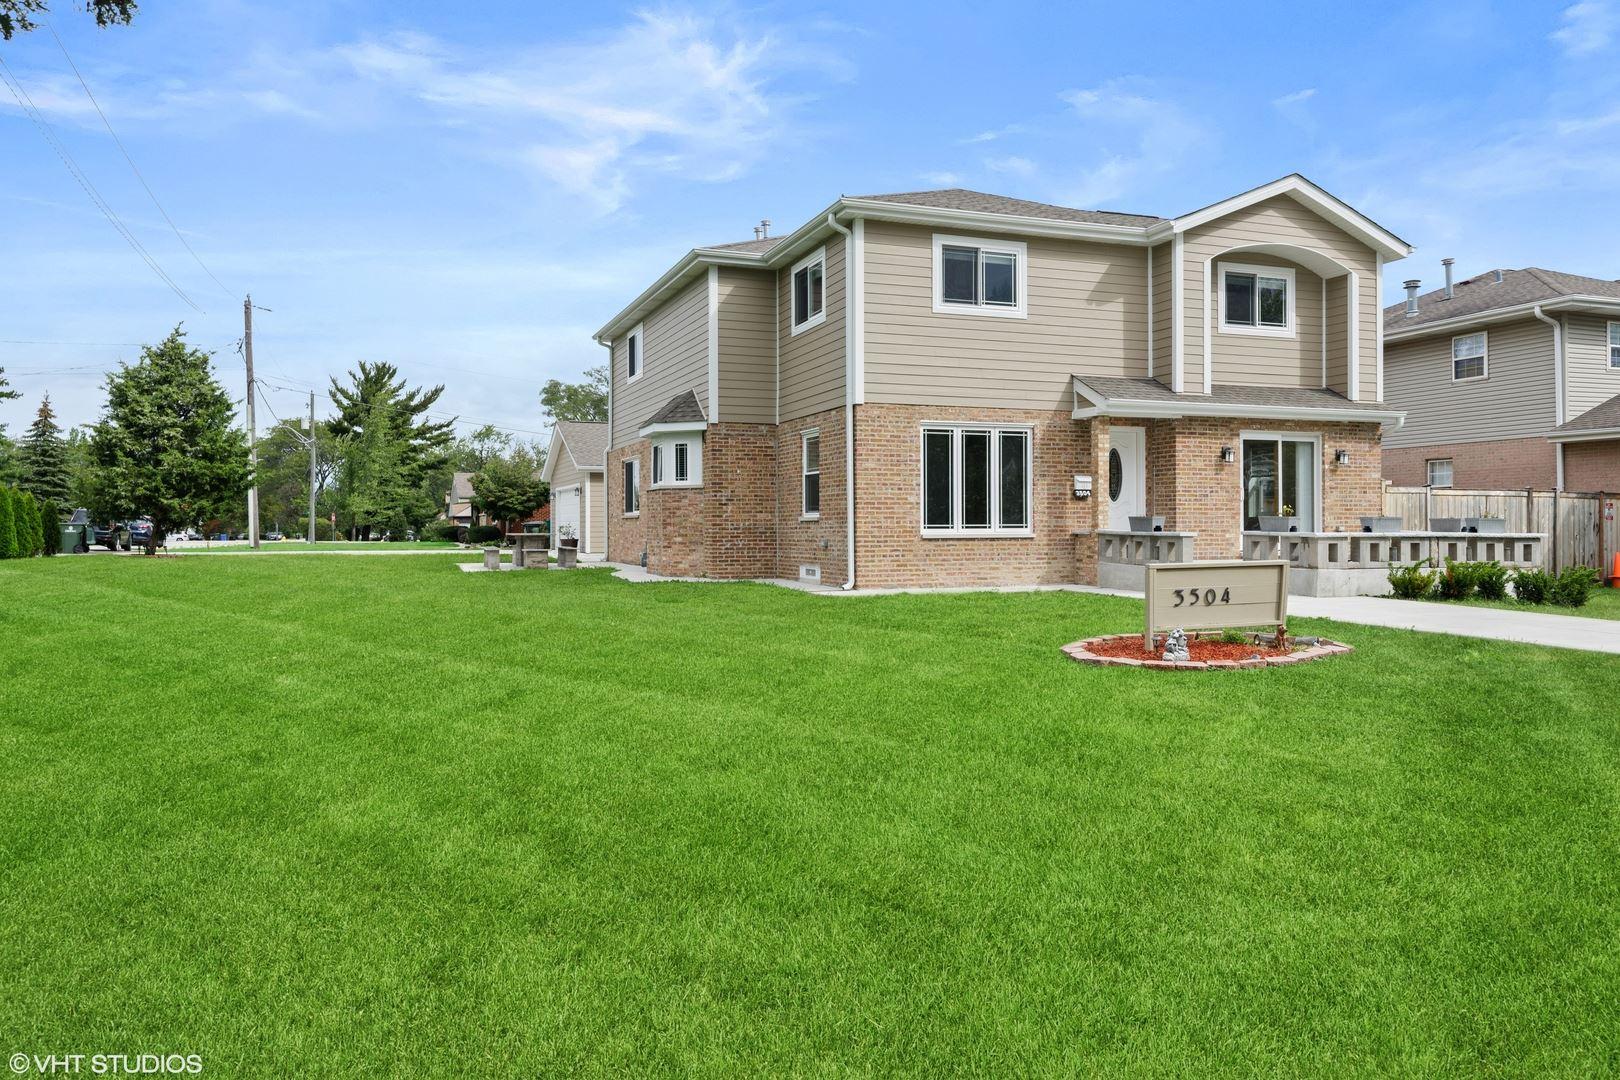 3504 LINNEMAN Street, Glenview, IL 60025 - #: 11233334